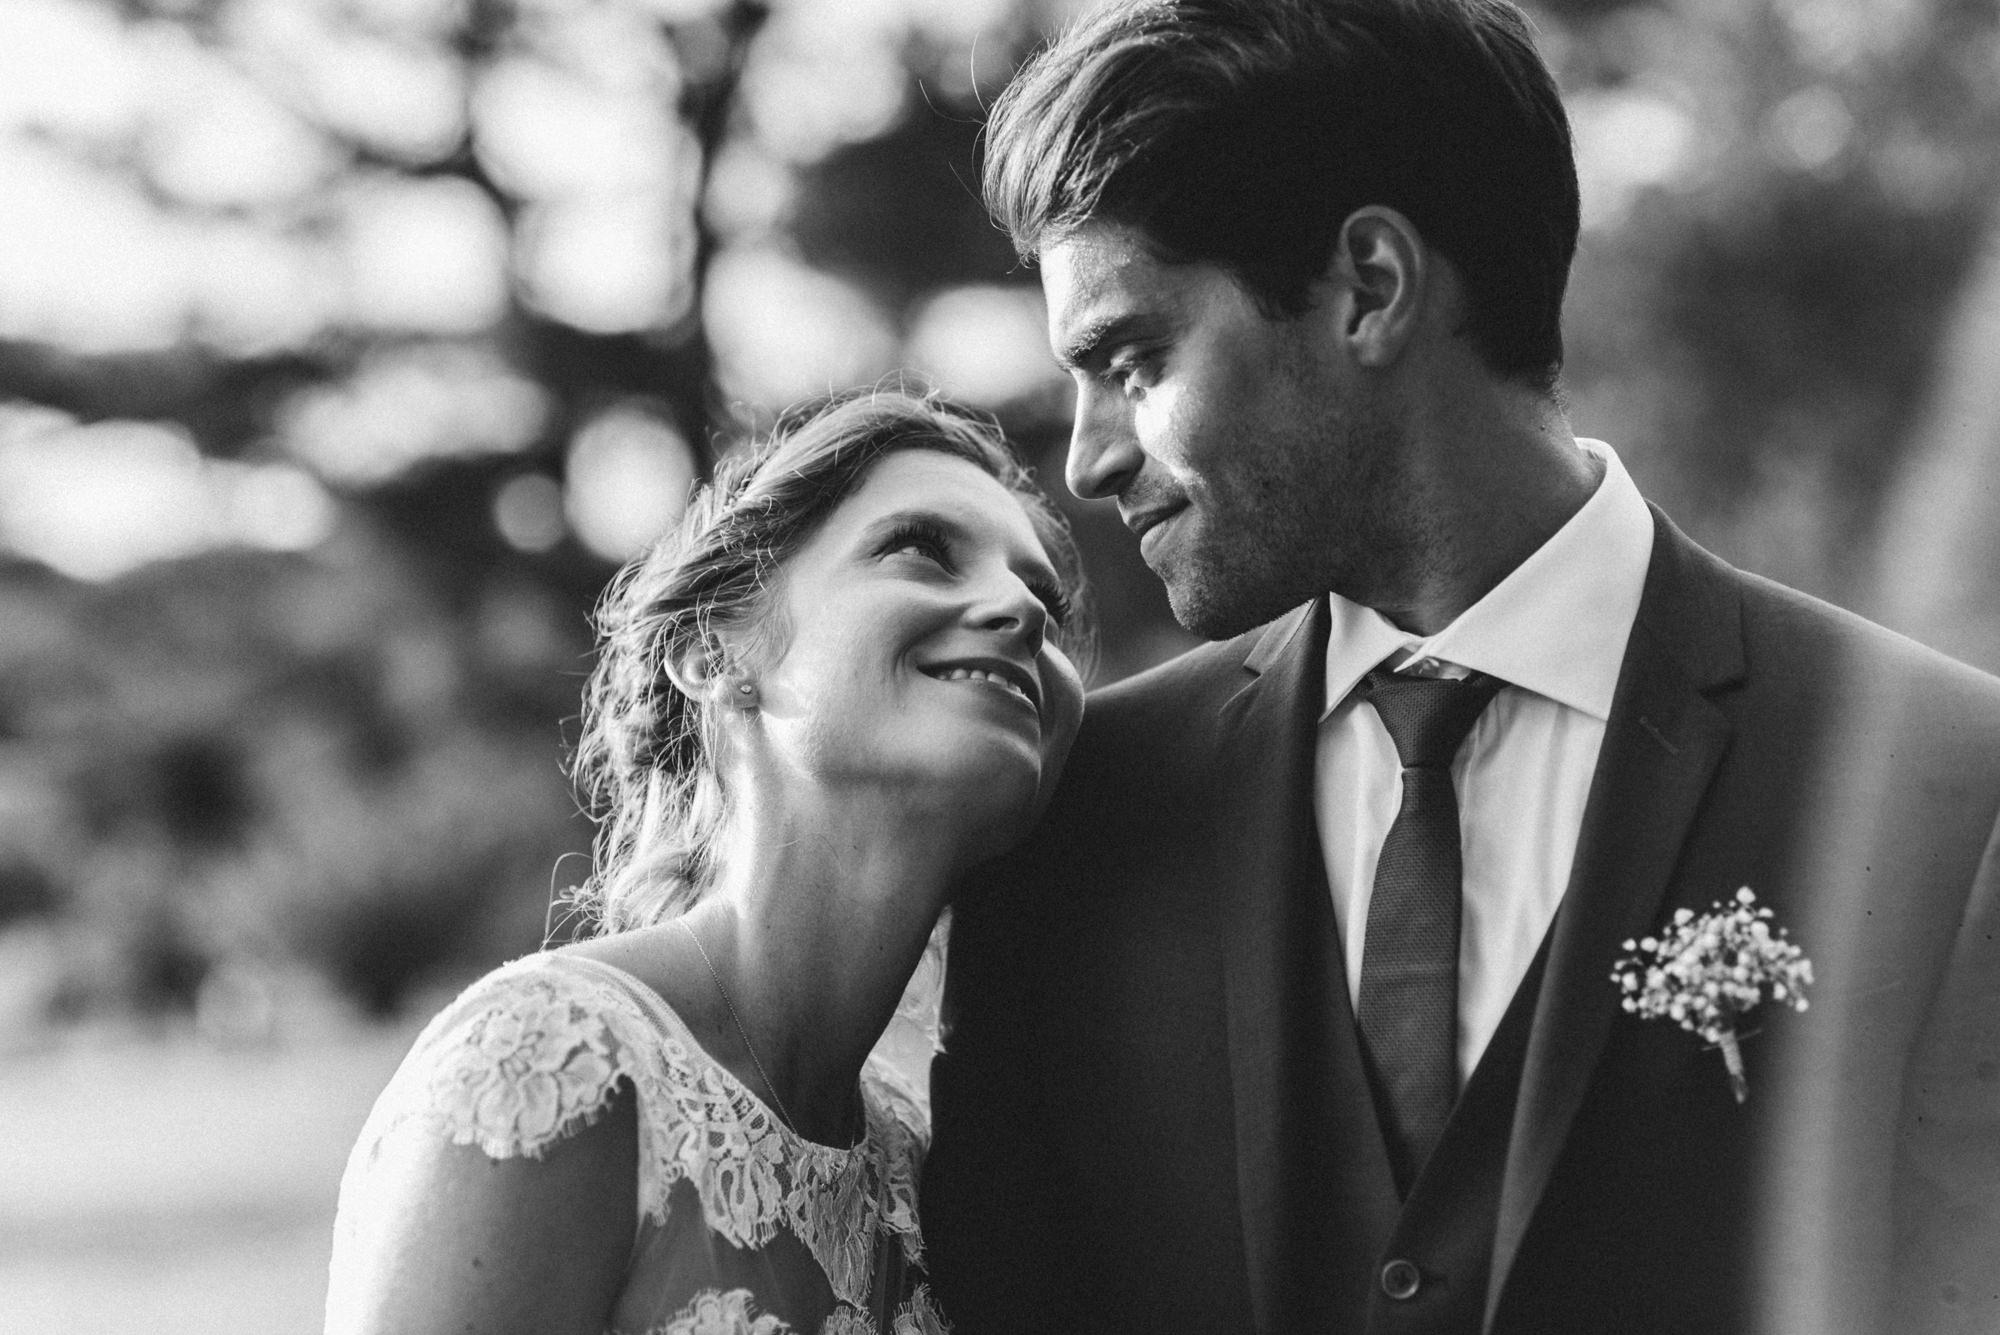 photographe-mariage-paris-nantes-provence-angers-57